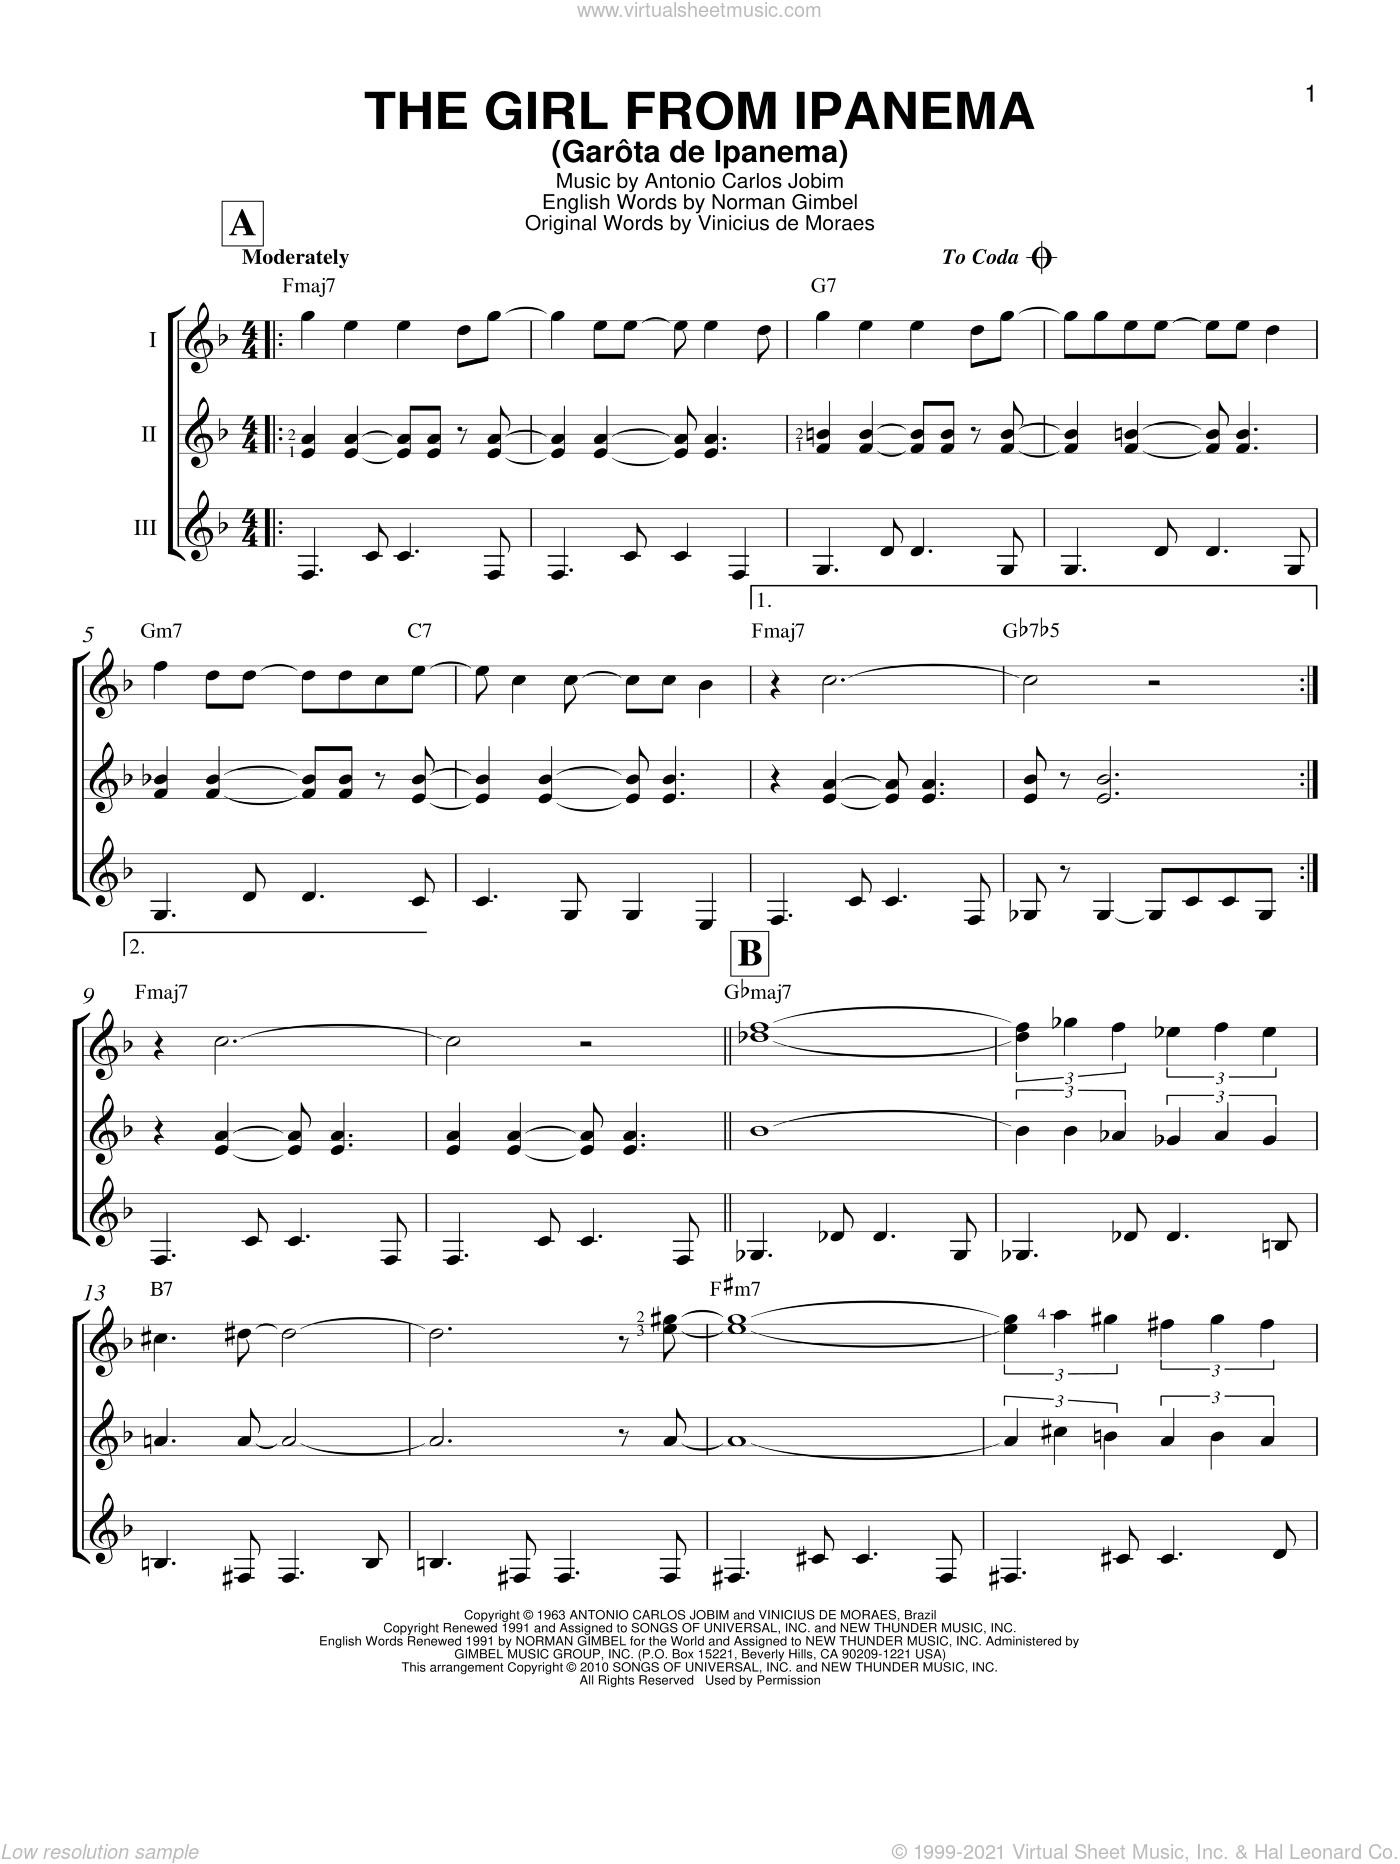 The Girl From Ipanema (Garota De Ipanema) sheet music for guitar ensemble by Antonio Carlos Jobim, Stan Getz & Astrud Gilberto, Norman Gimbel and Vinicius de Moraes, intermediate skill level